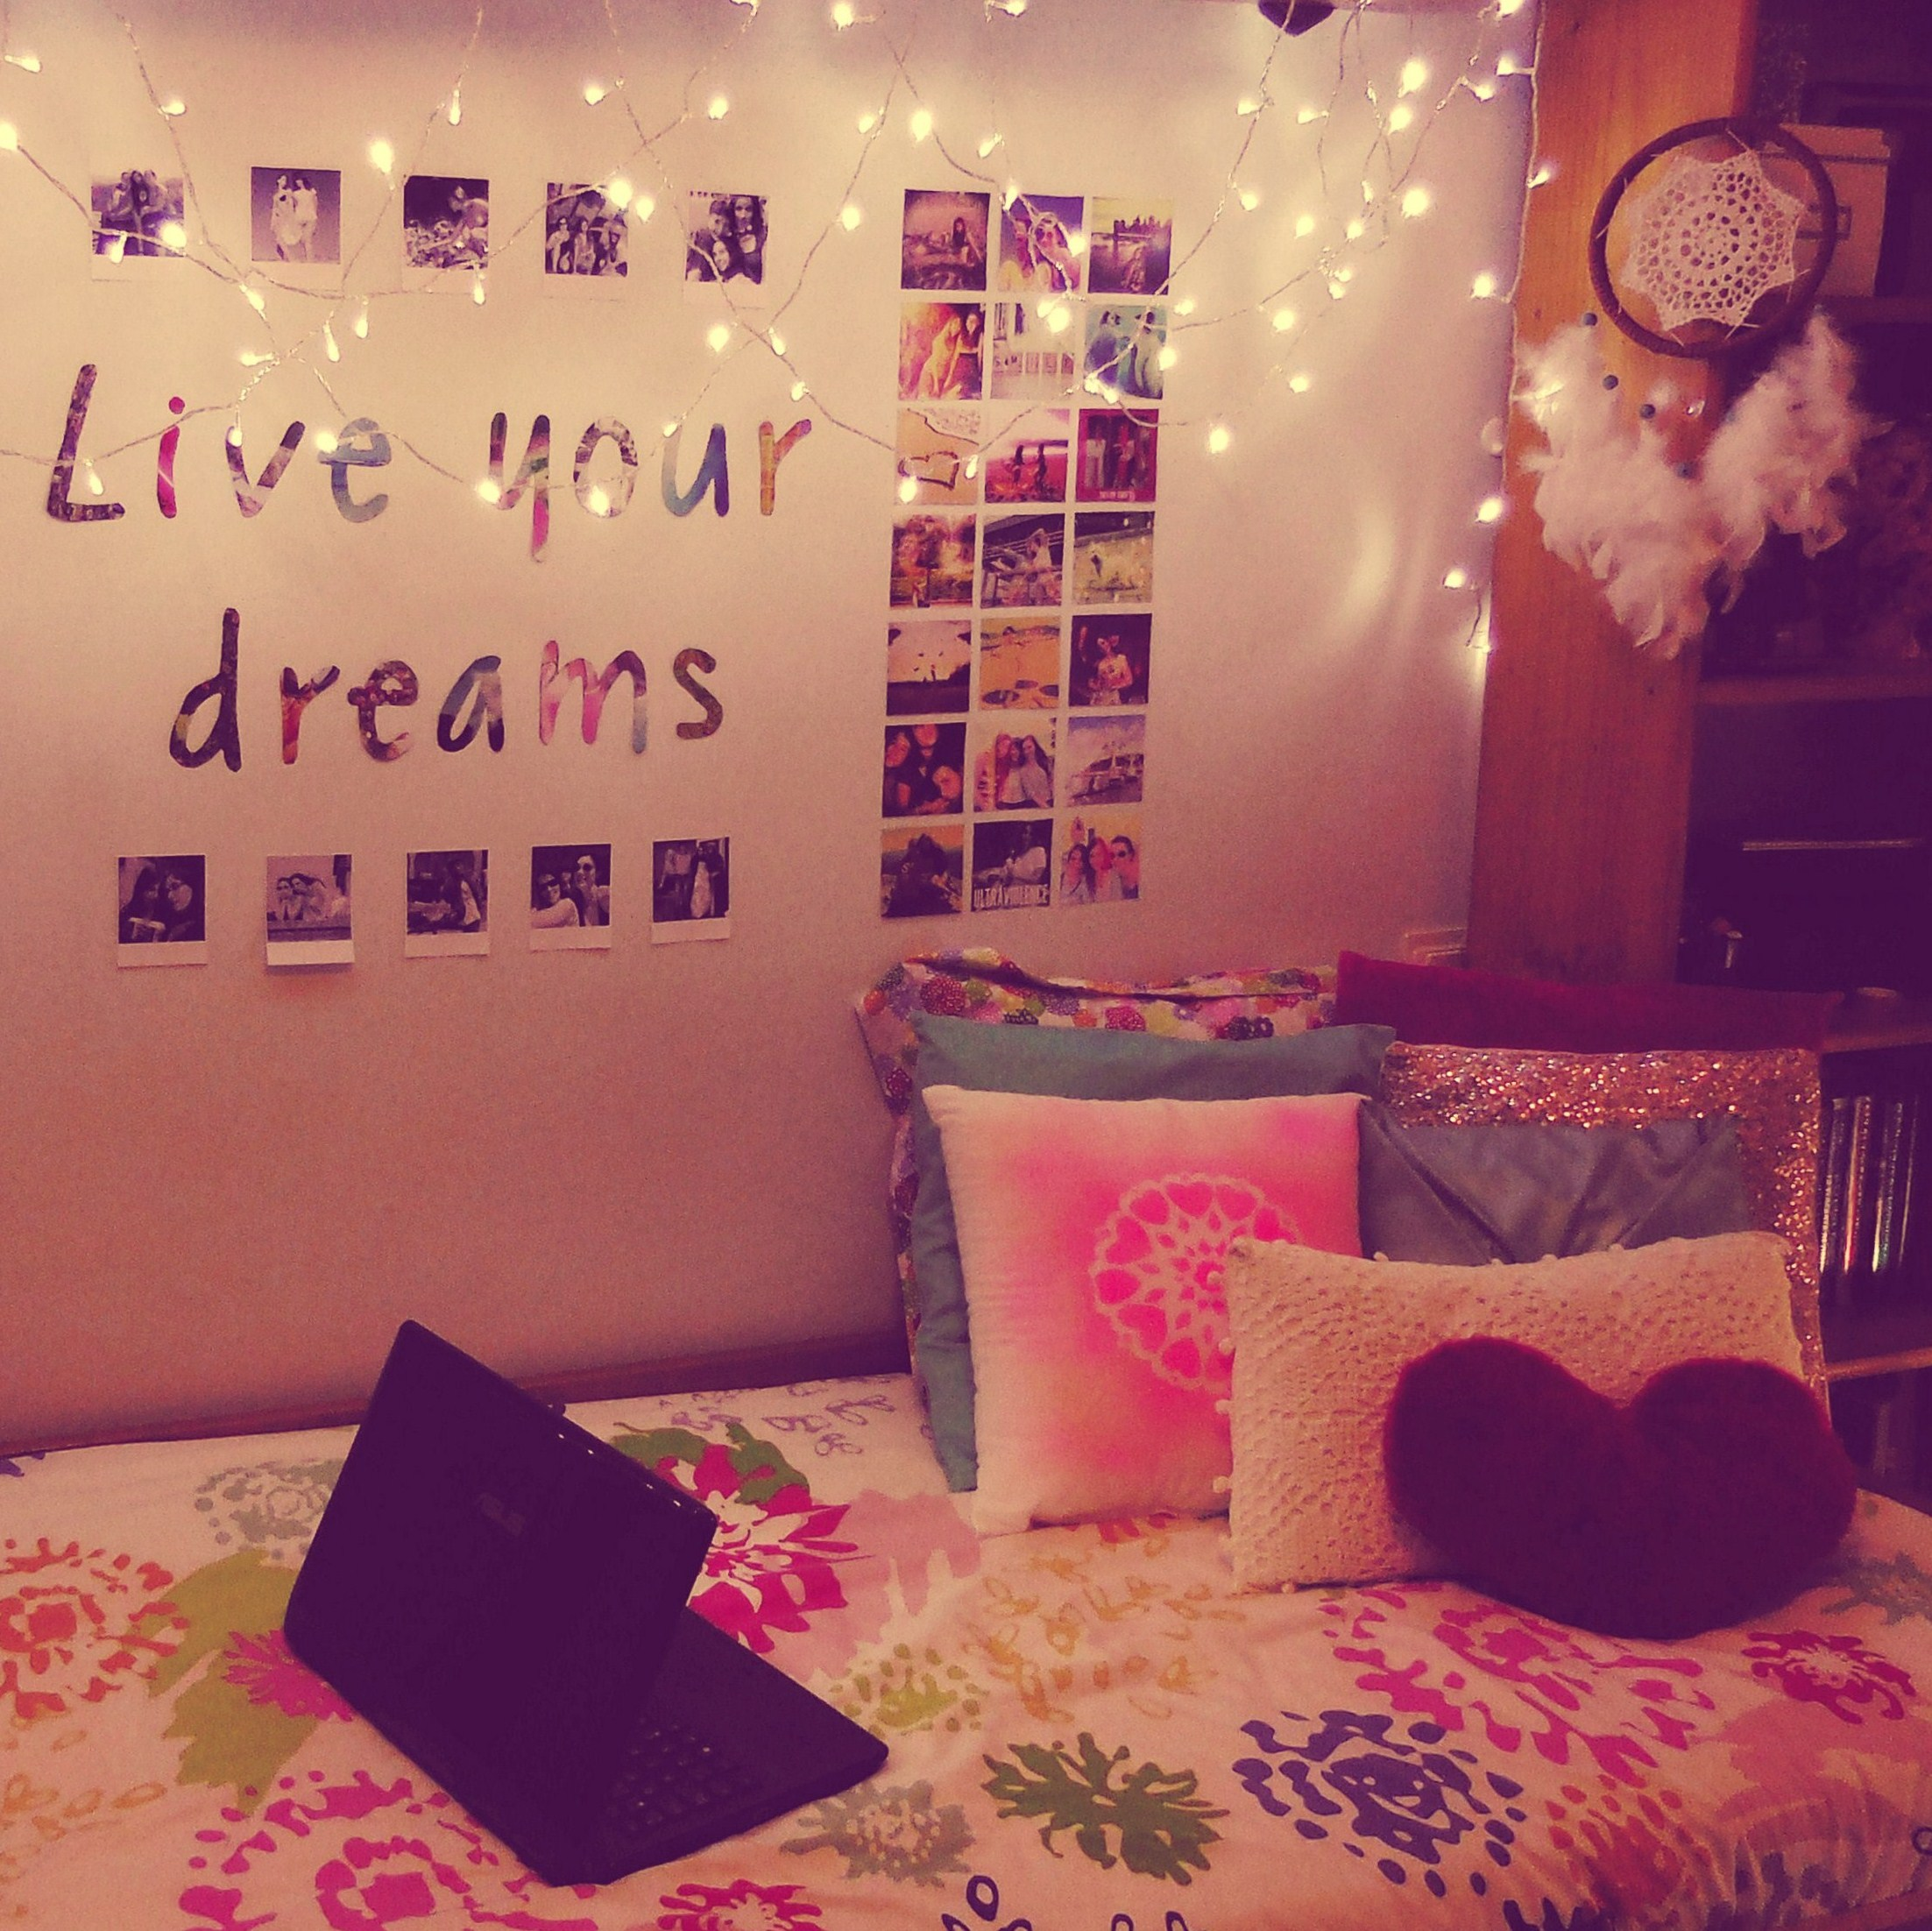 DIY Tumblr Inspired Room Decor Ideas! Easy & Fun ... on Photo Room Decor  id=49476